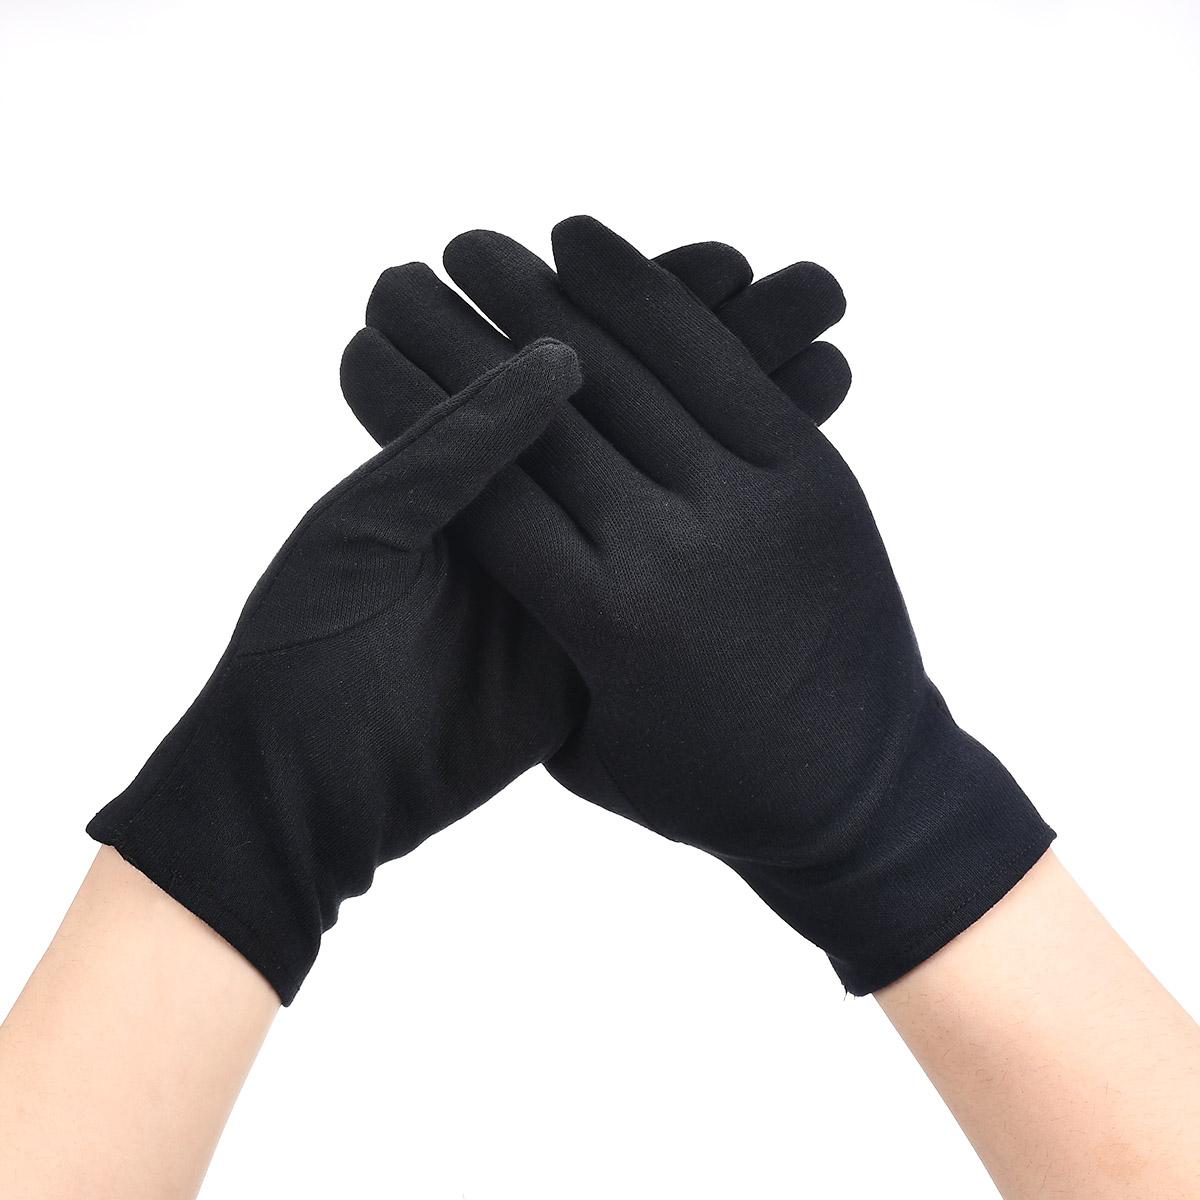 6/4/2Pairs Women Men Gloves Black White Etiquette Thin Gloves Stretch Sunscreen Gloves Dance Tight Jewelry Gloves Driving Gloves